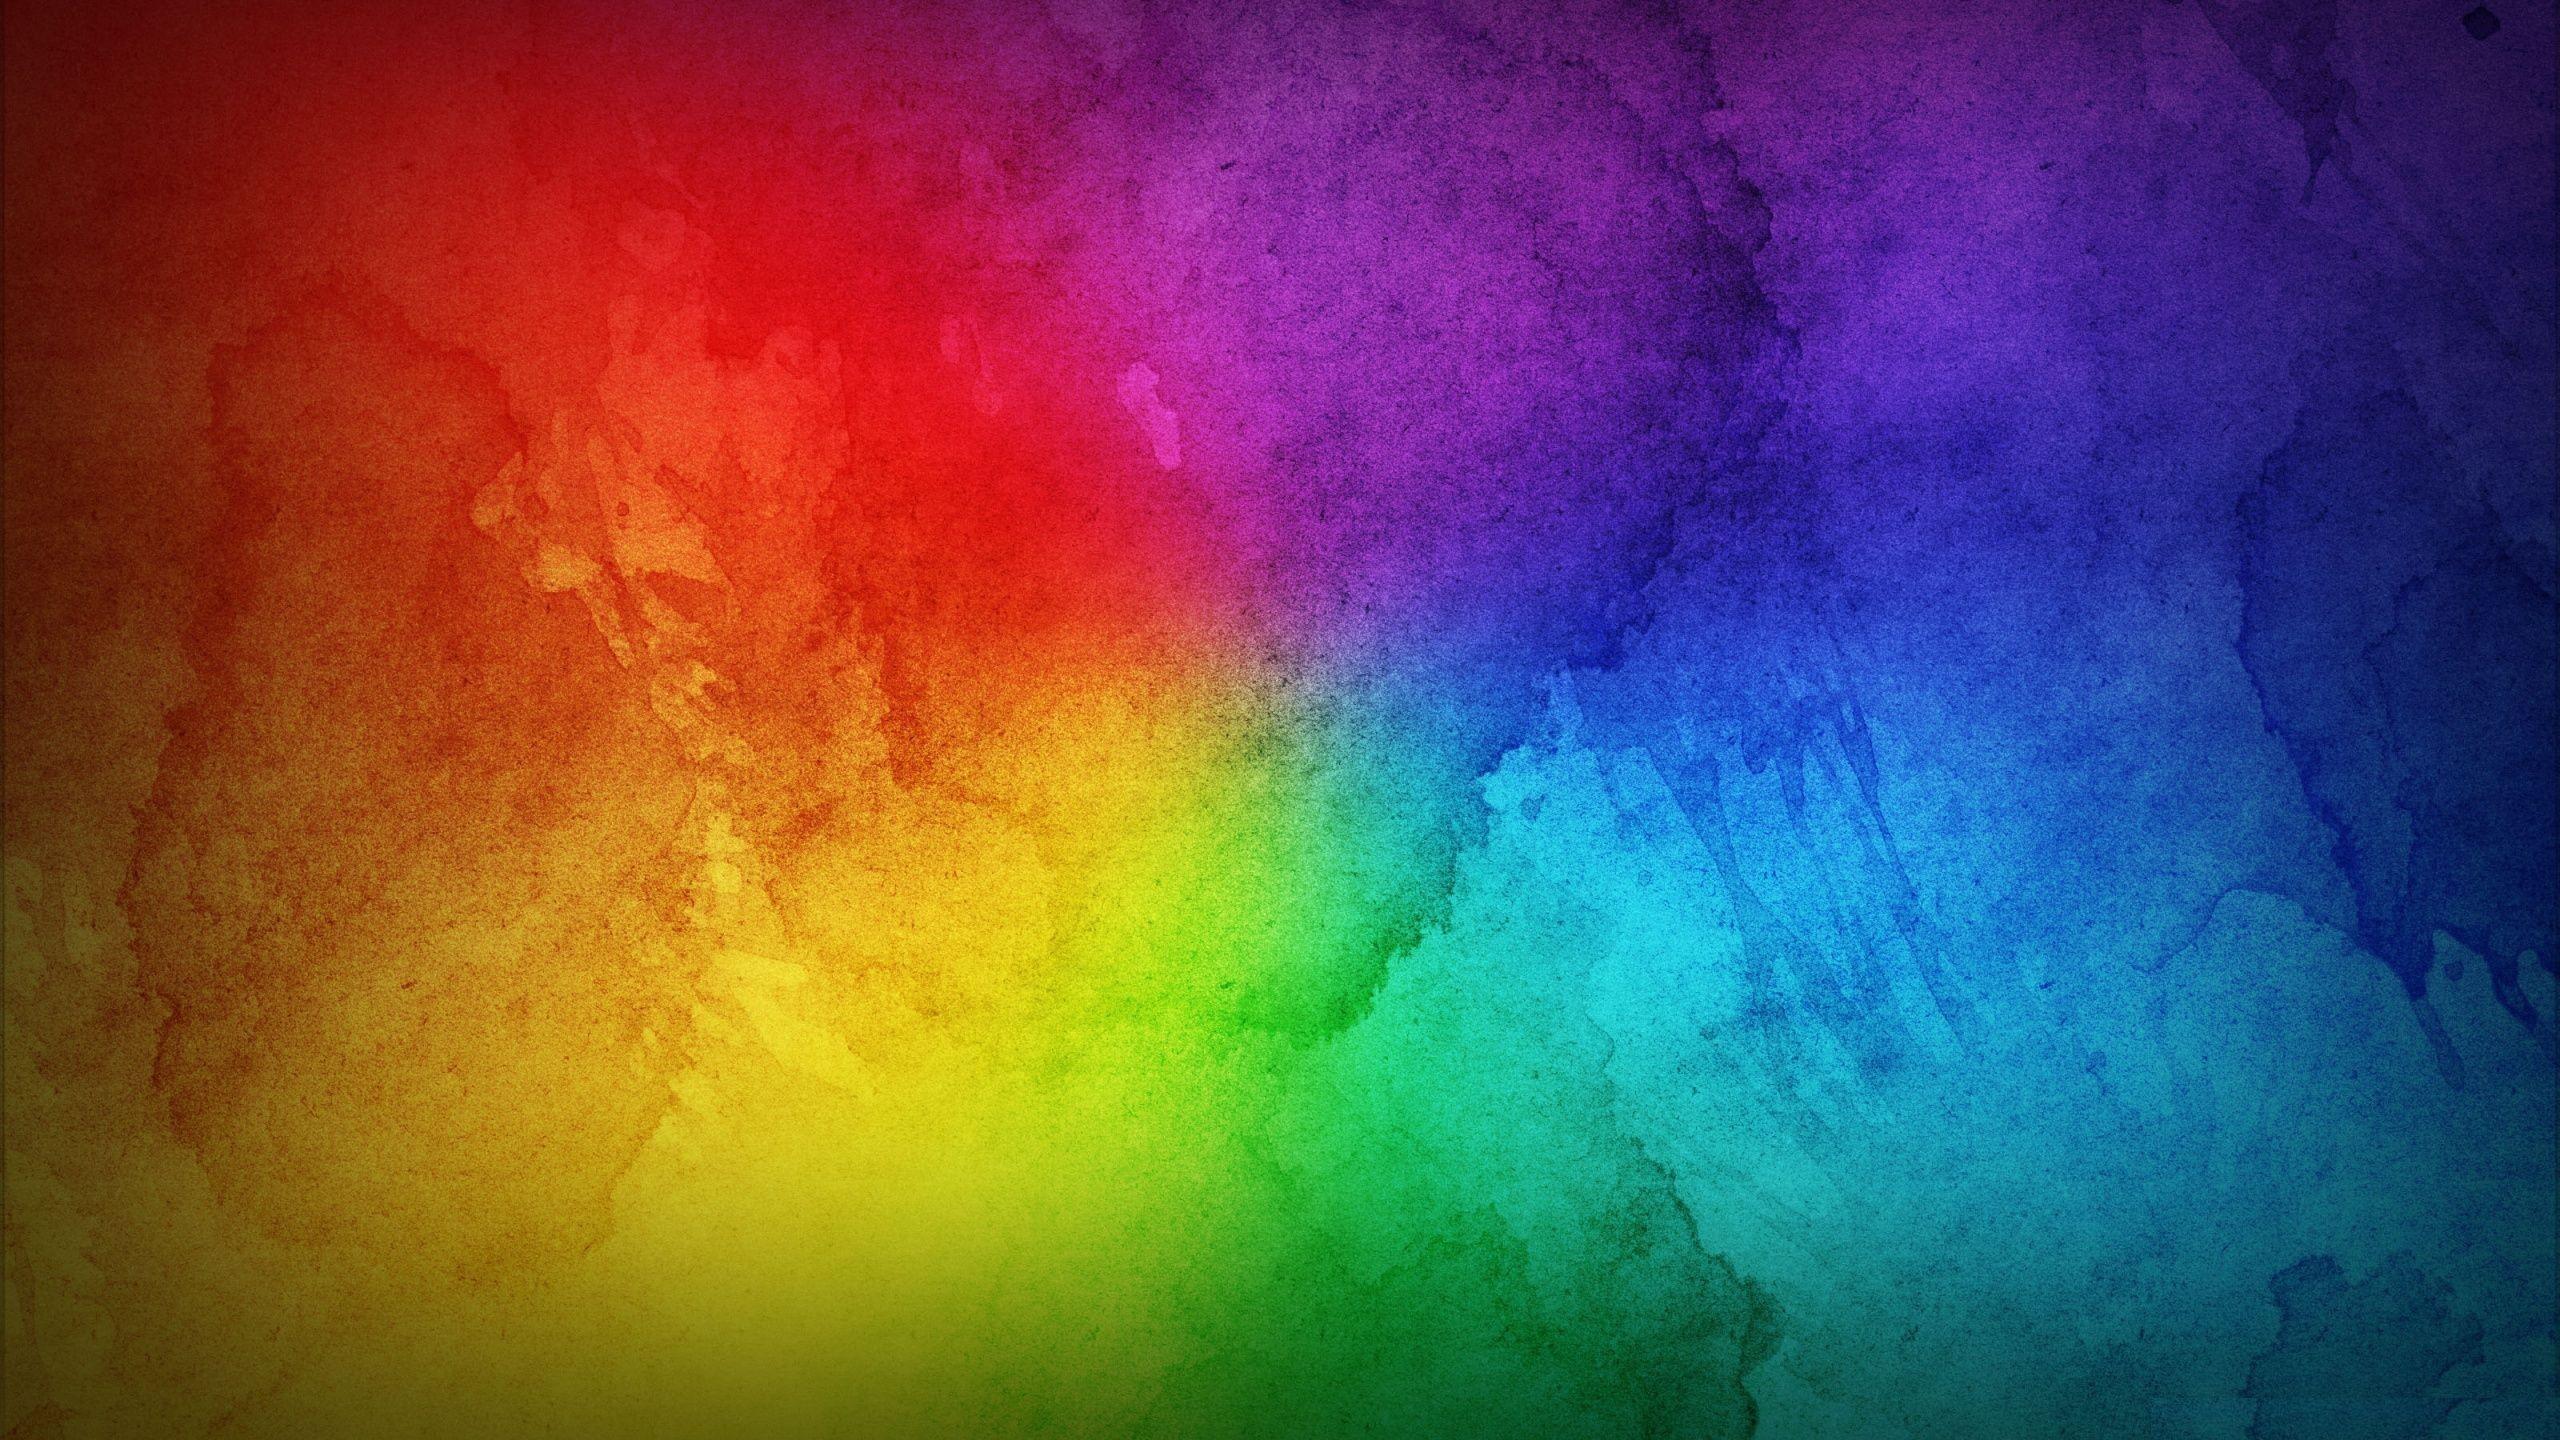 Free Download Rainbow Full Screen Hd Wallpaper Desktop